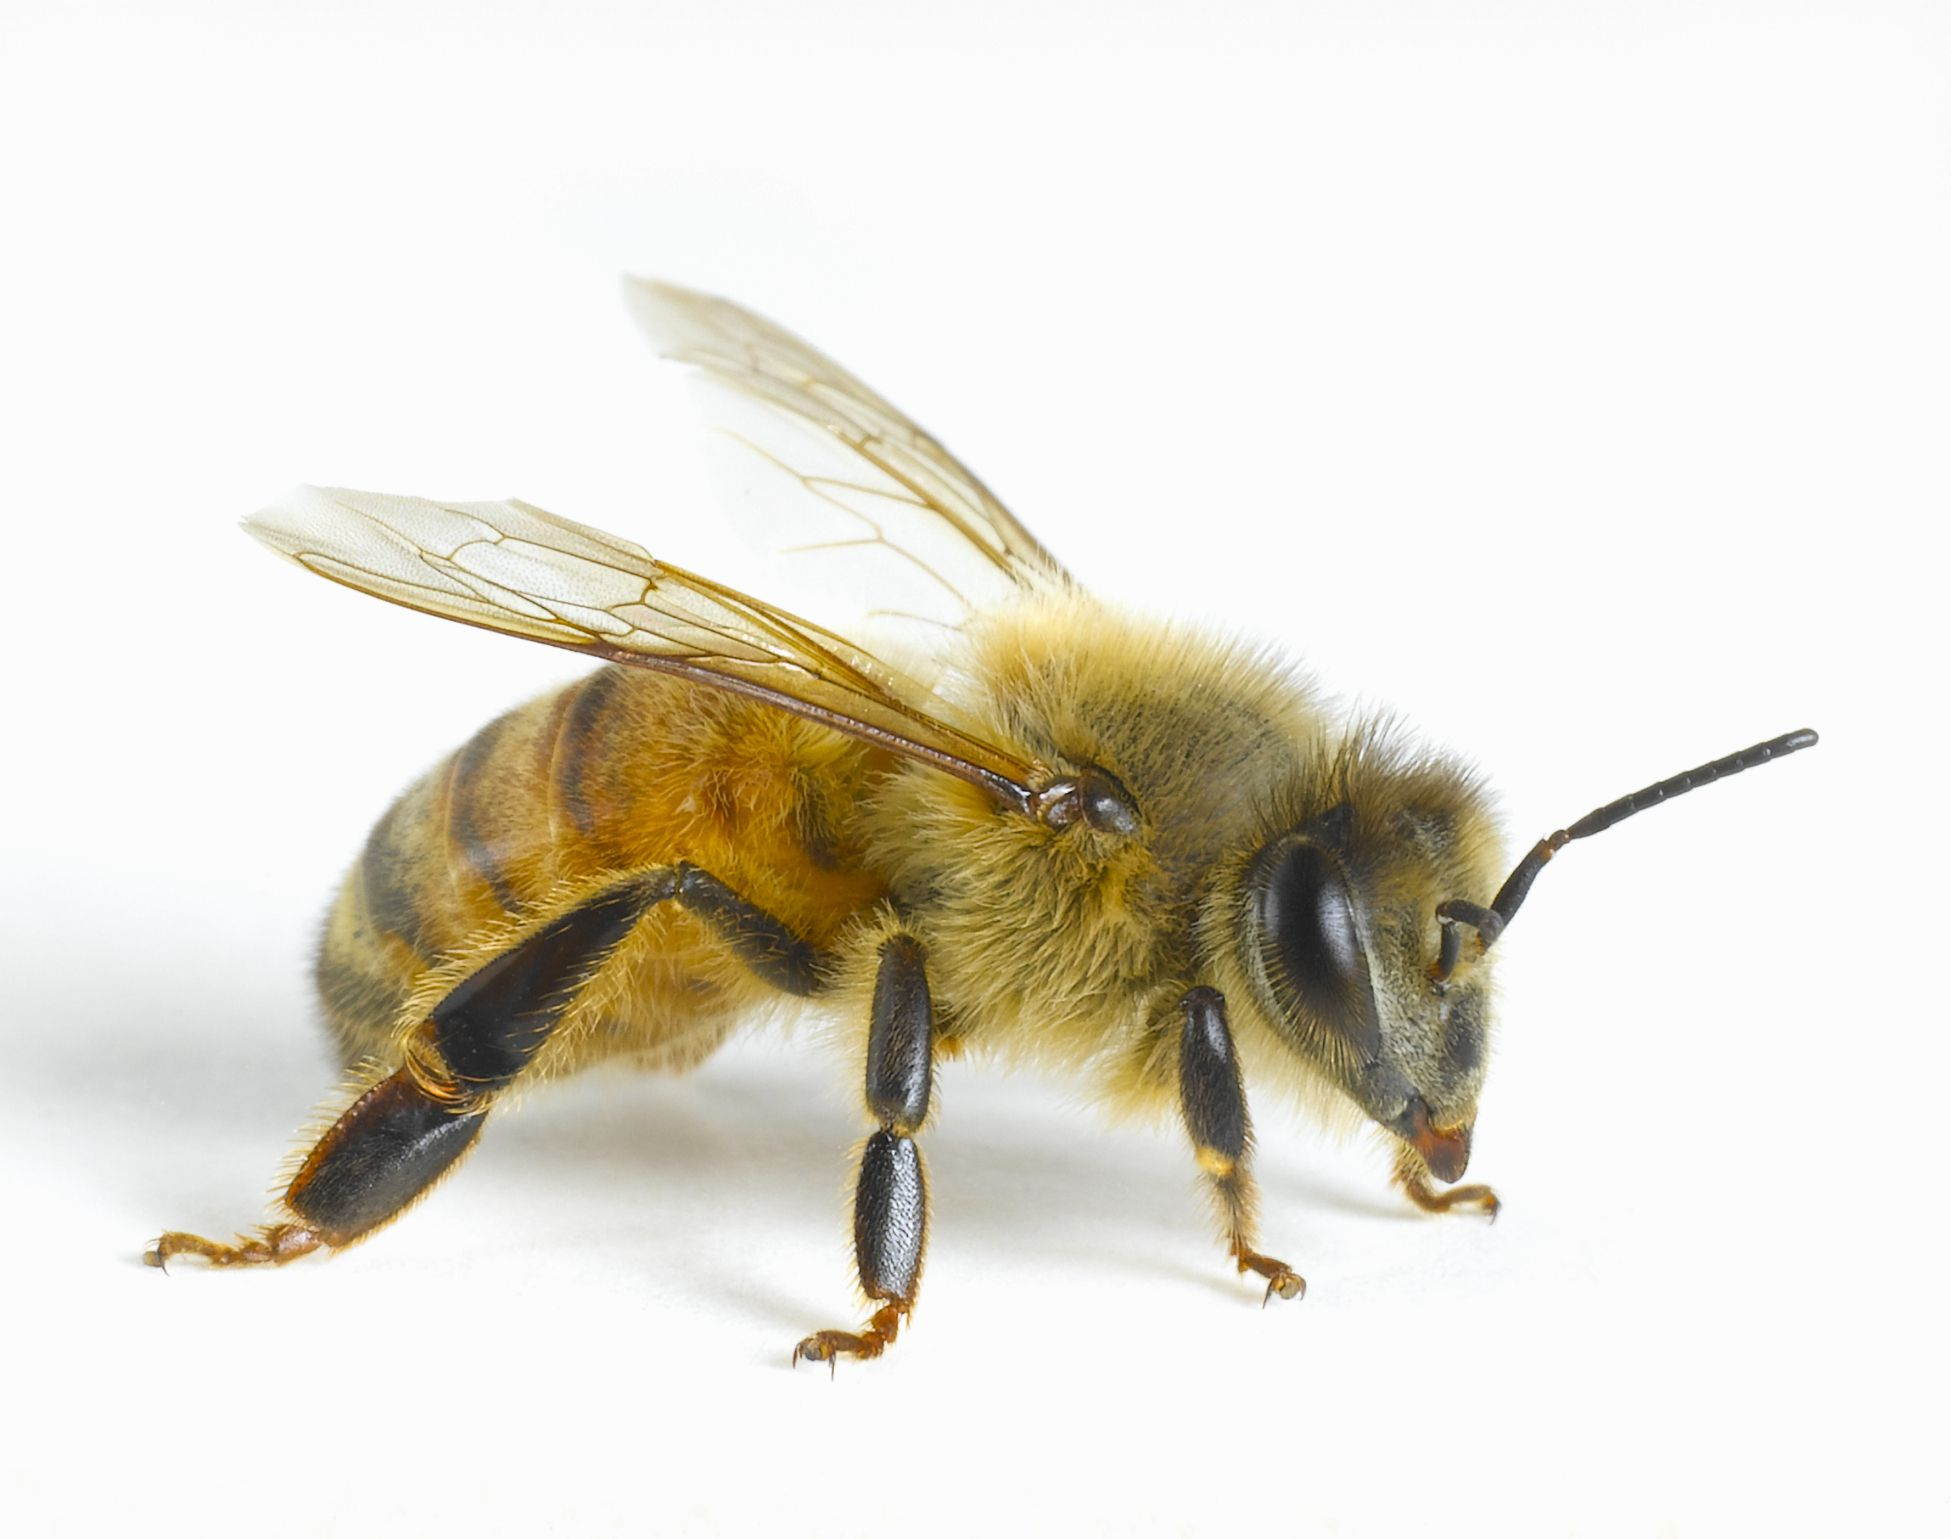 Honey Bees, Apis mellifera - photo#23